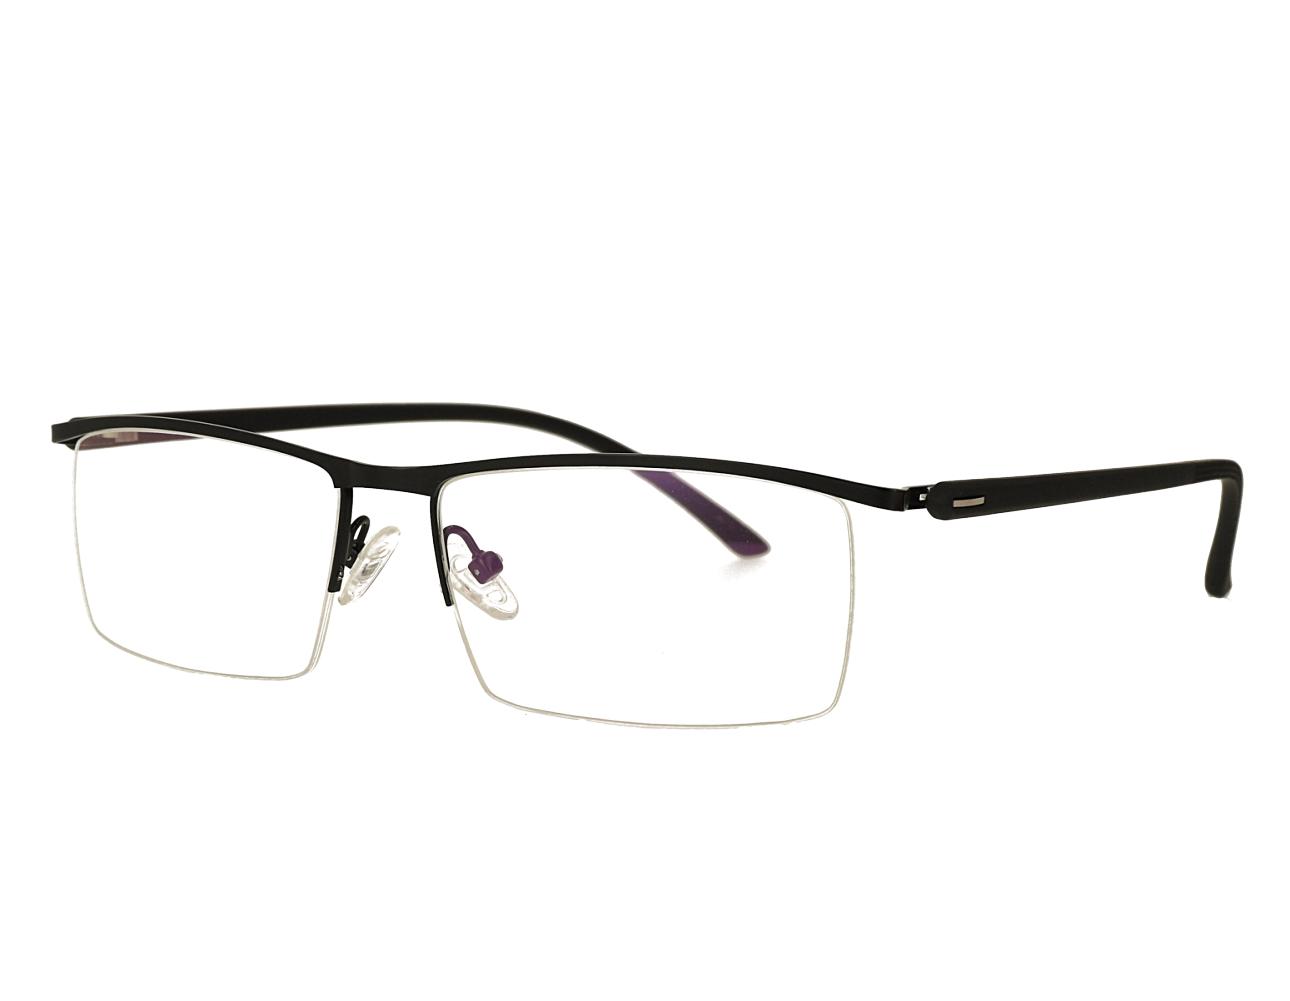 Man's Half Rim Metal Frame Optical Glasses with flexiable hinge